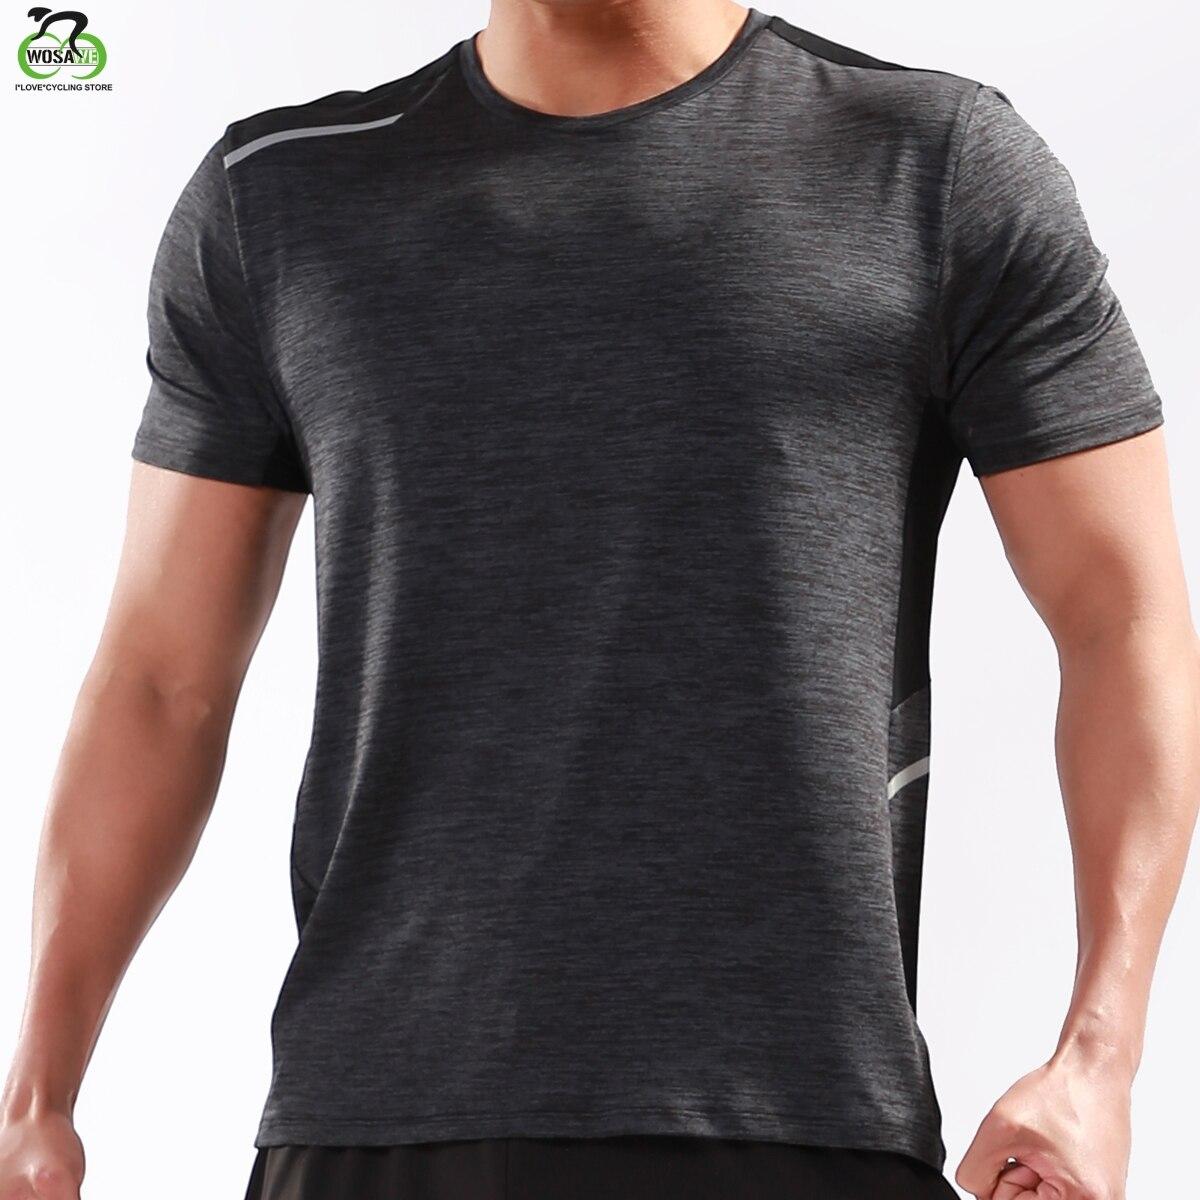 WOSAWE Running Shirt Men Sports Running Shirt Quick Dry Basketball Soccer Training T Shirt Men Gym Clothing Sportswear